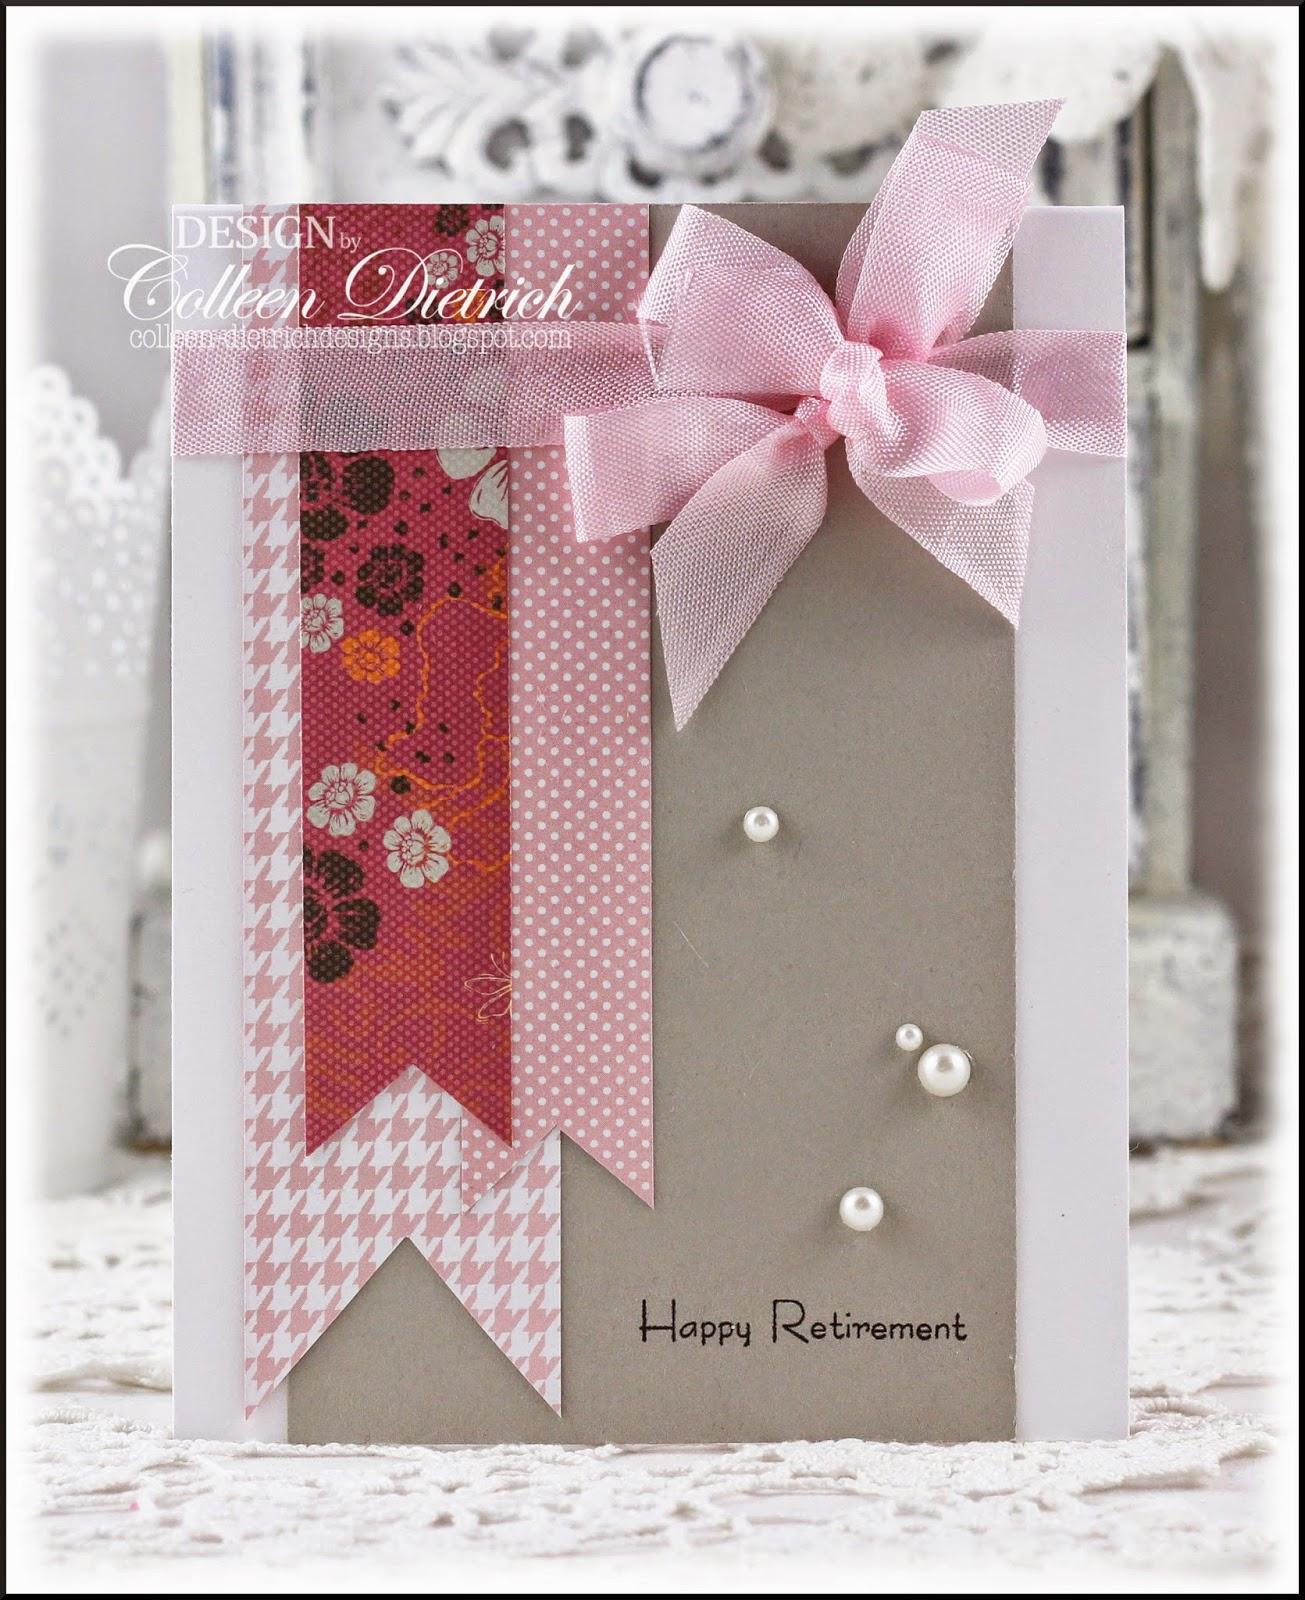 Retirement Card Principal | Retirement cards, Personal ... |Handmade Retirement Cards